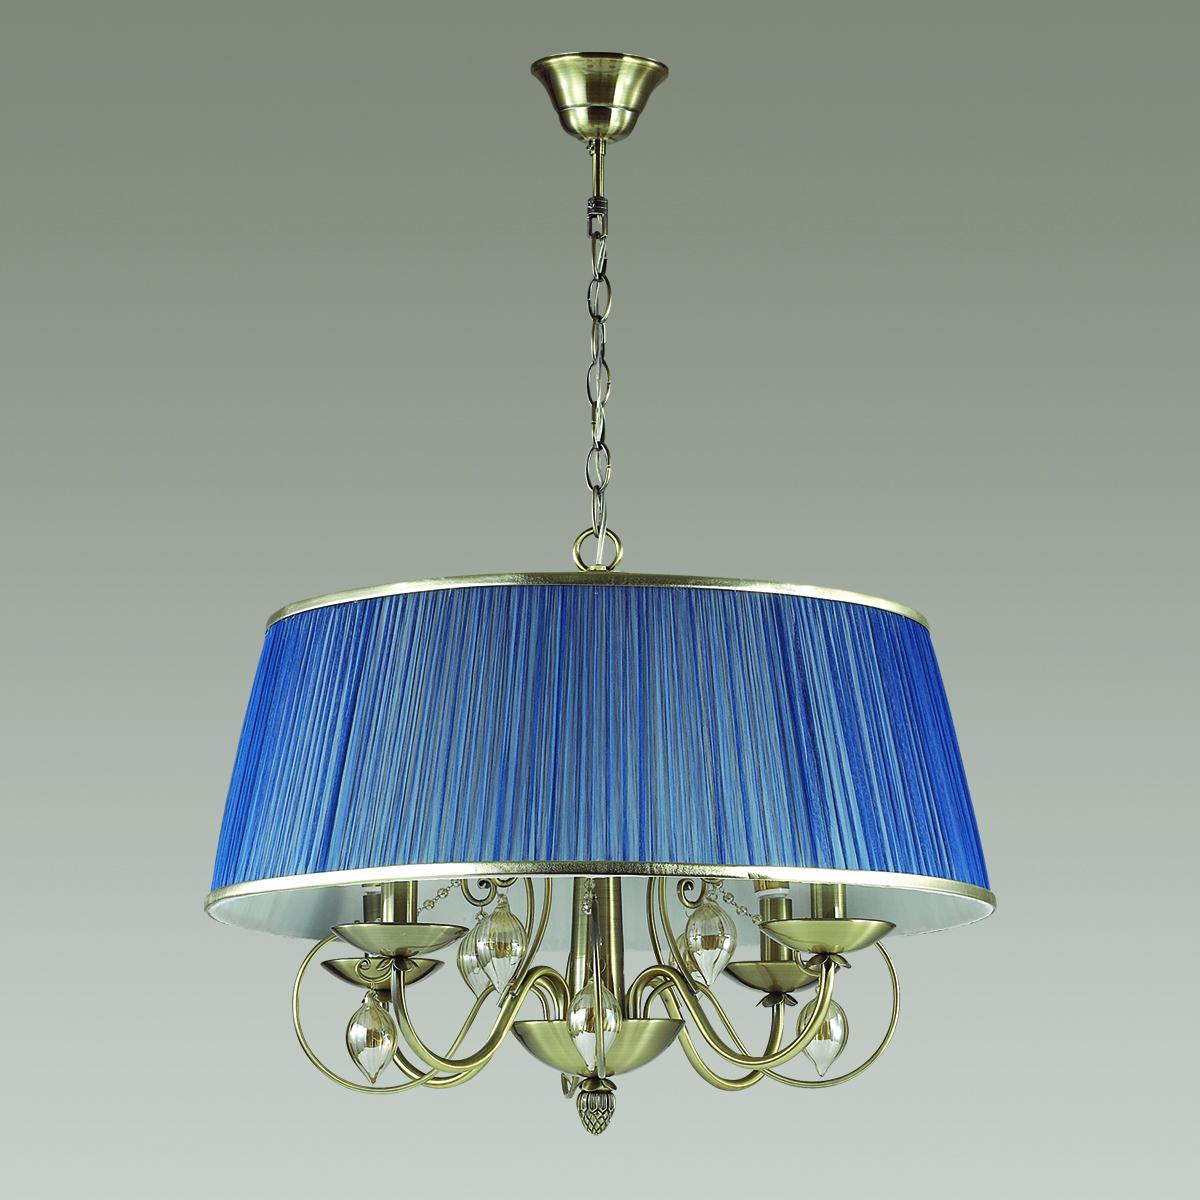 ODEON LIGHT 3921/4 ODL18 358 бронза/ткань/стекло Люстра IP20 E14 4*40W 220V NIAGARA